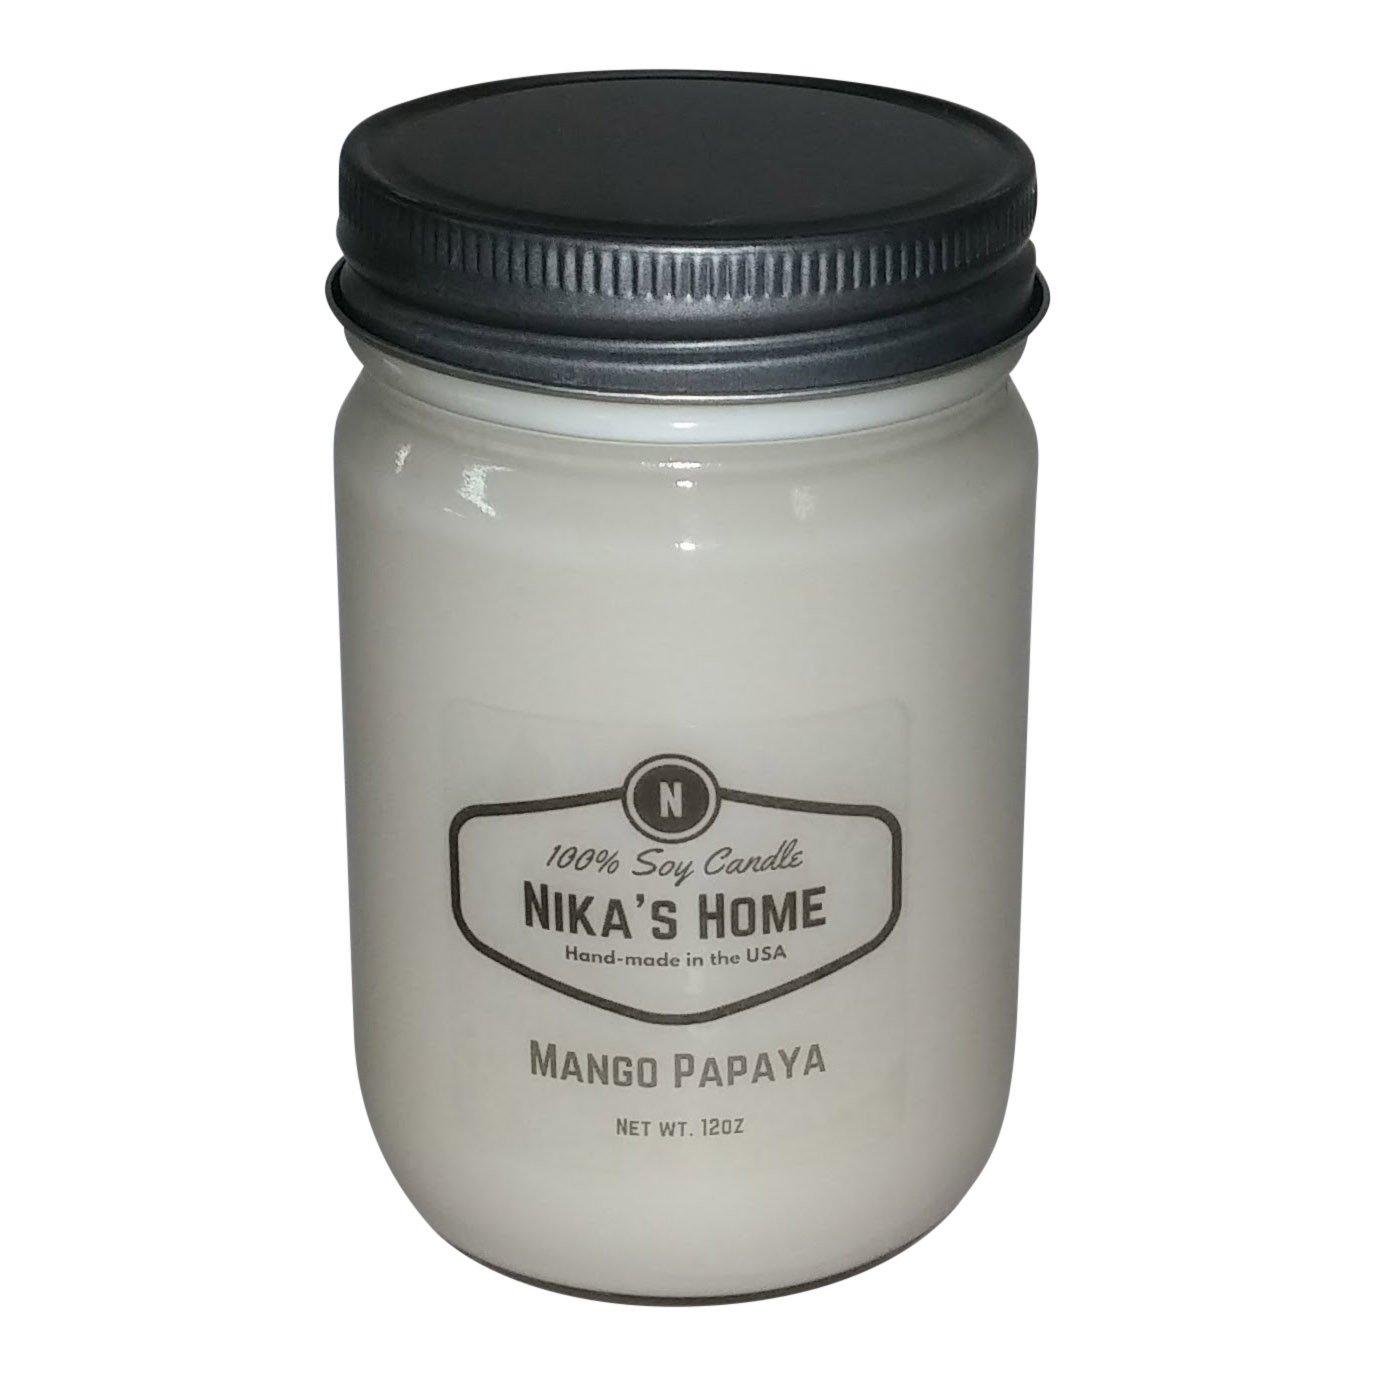 Nika's Home Mango Papaya Soy Candle - 12oz Mason Jar